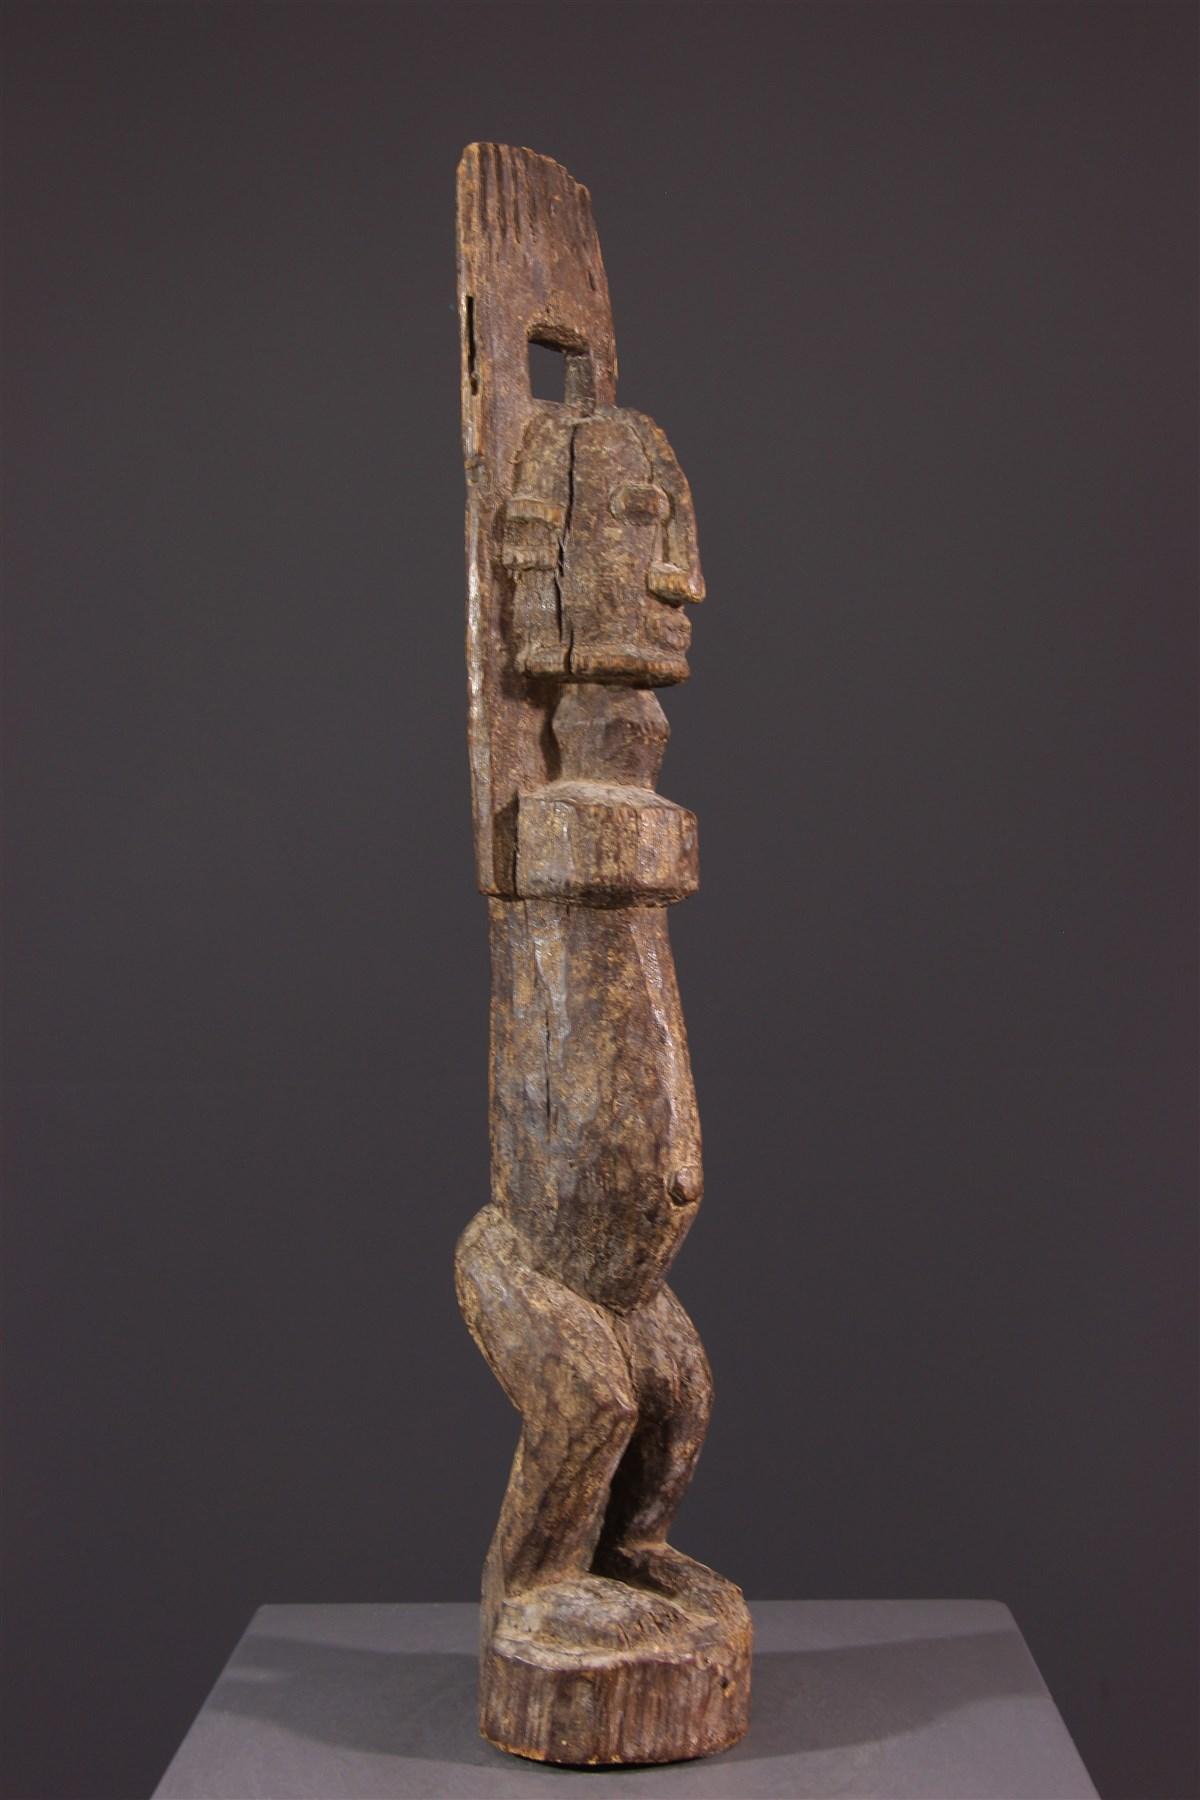 Statuette Dogon Tellem - African art